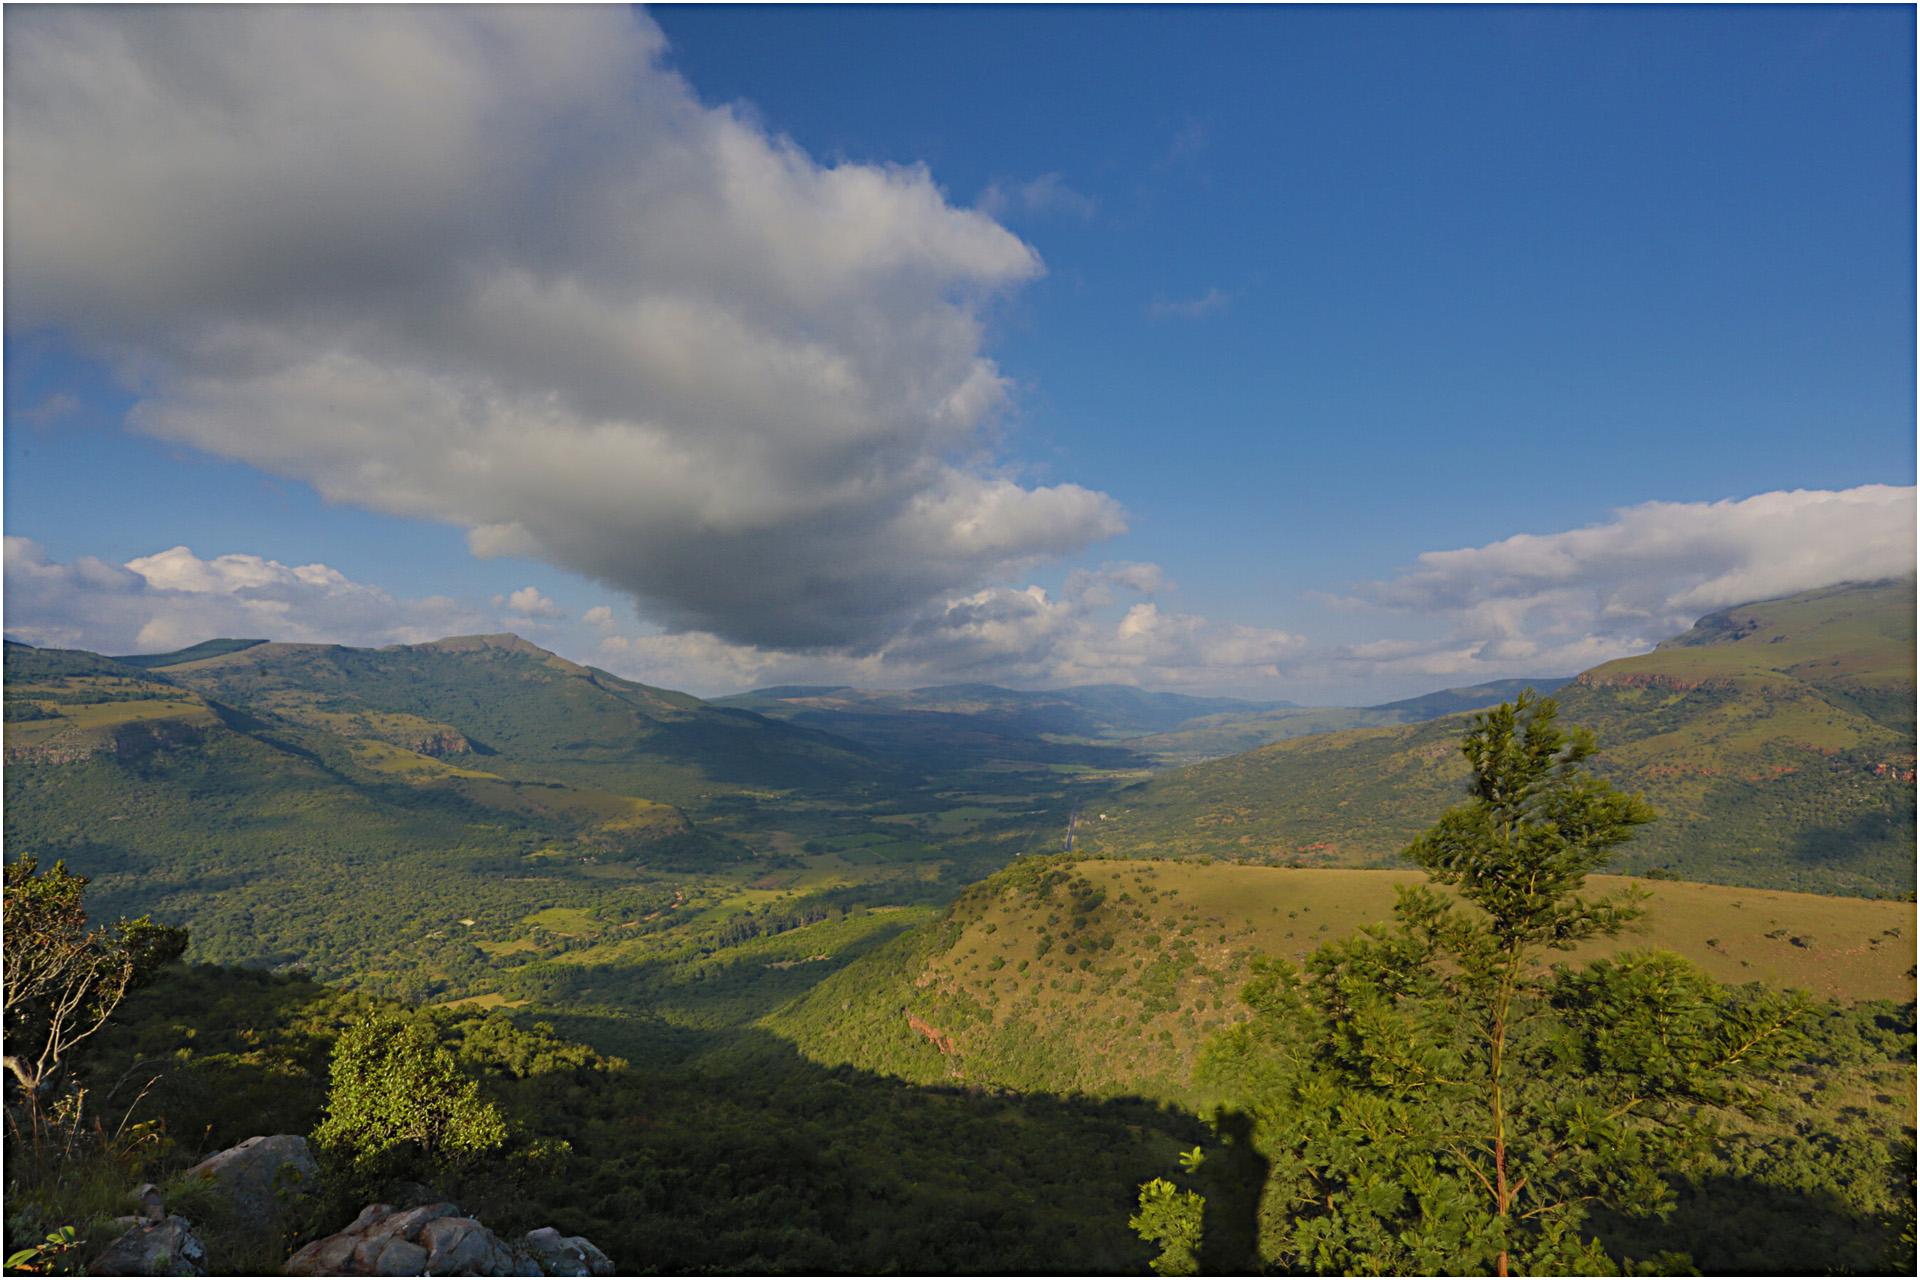 mpumalanga accommodation prices and rates Drakenzicht The Mountain Links